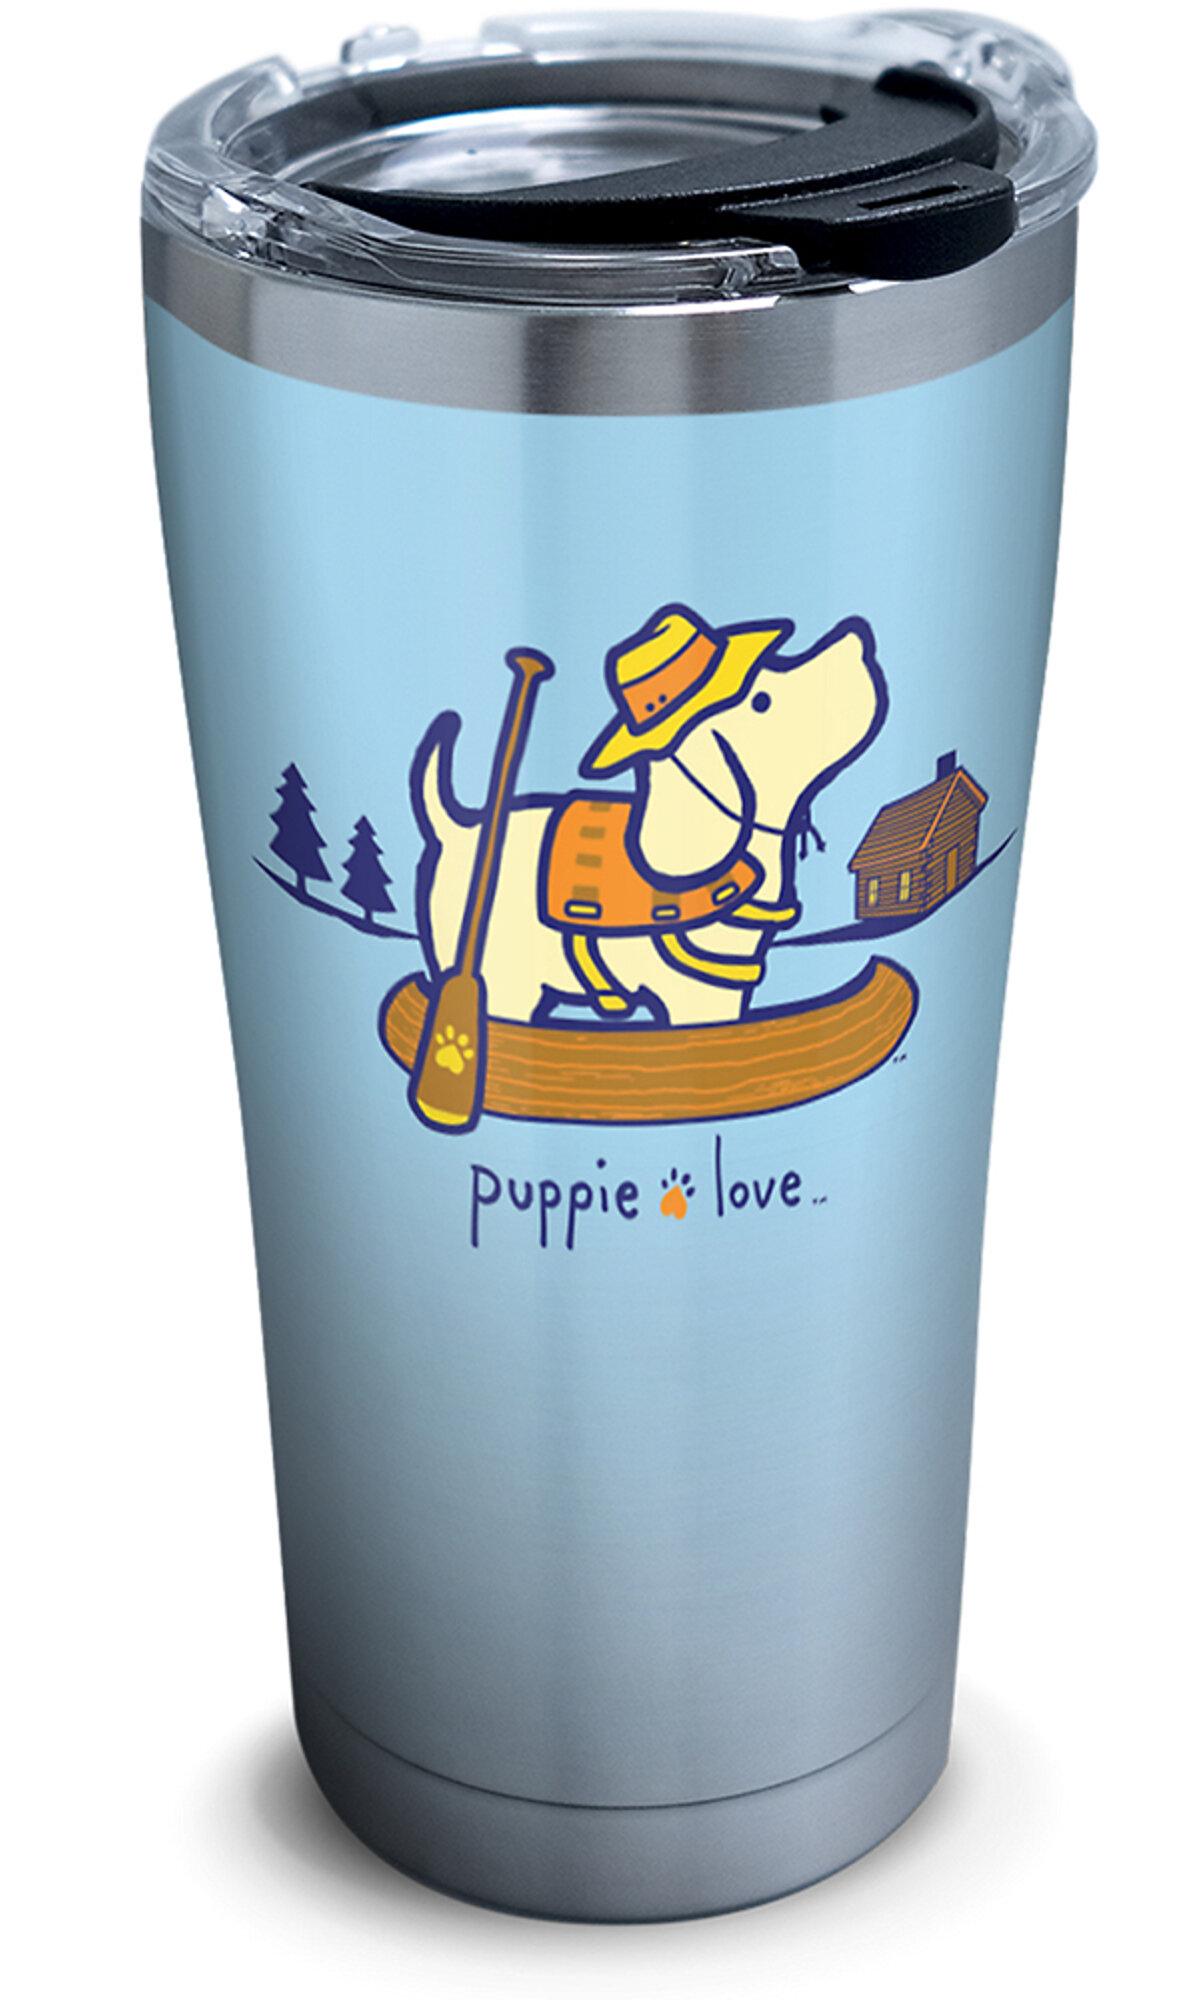 Tervis Tumbler Puppie Love Canoe 20 Oz Stainless Steel Travel Tumbler Wayfair